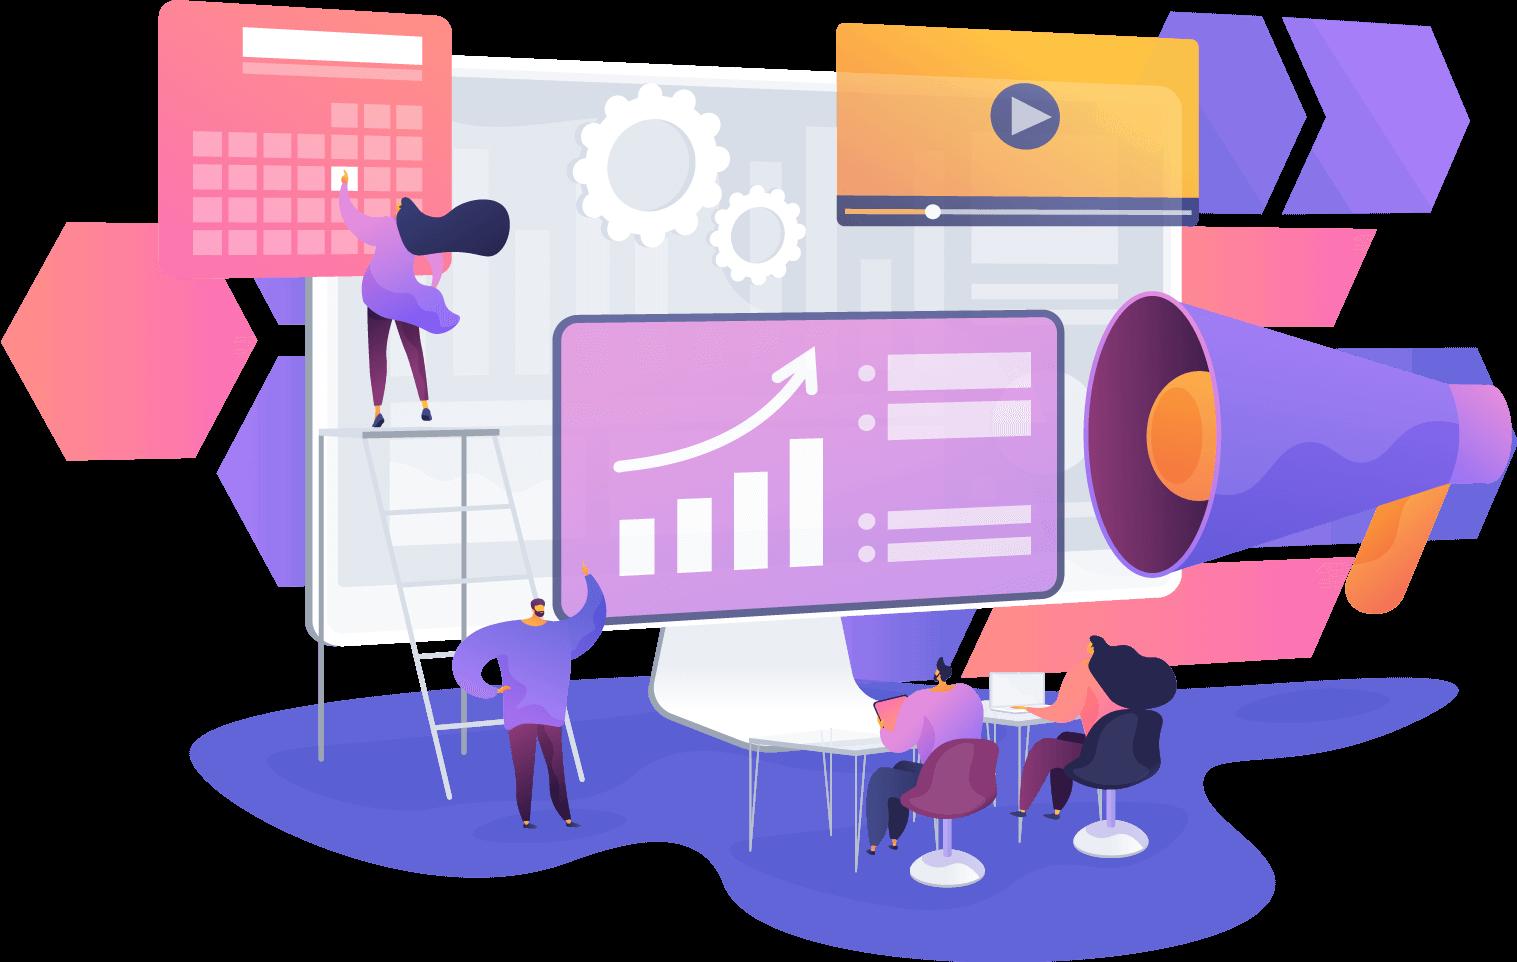 big data, data analytics consultants, data, analytics services, big data consulting, google analytics, power BI, business intelligence, tableau